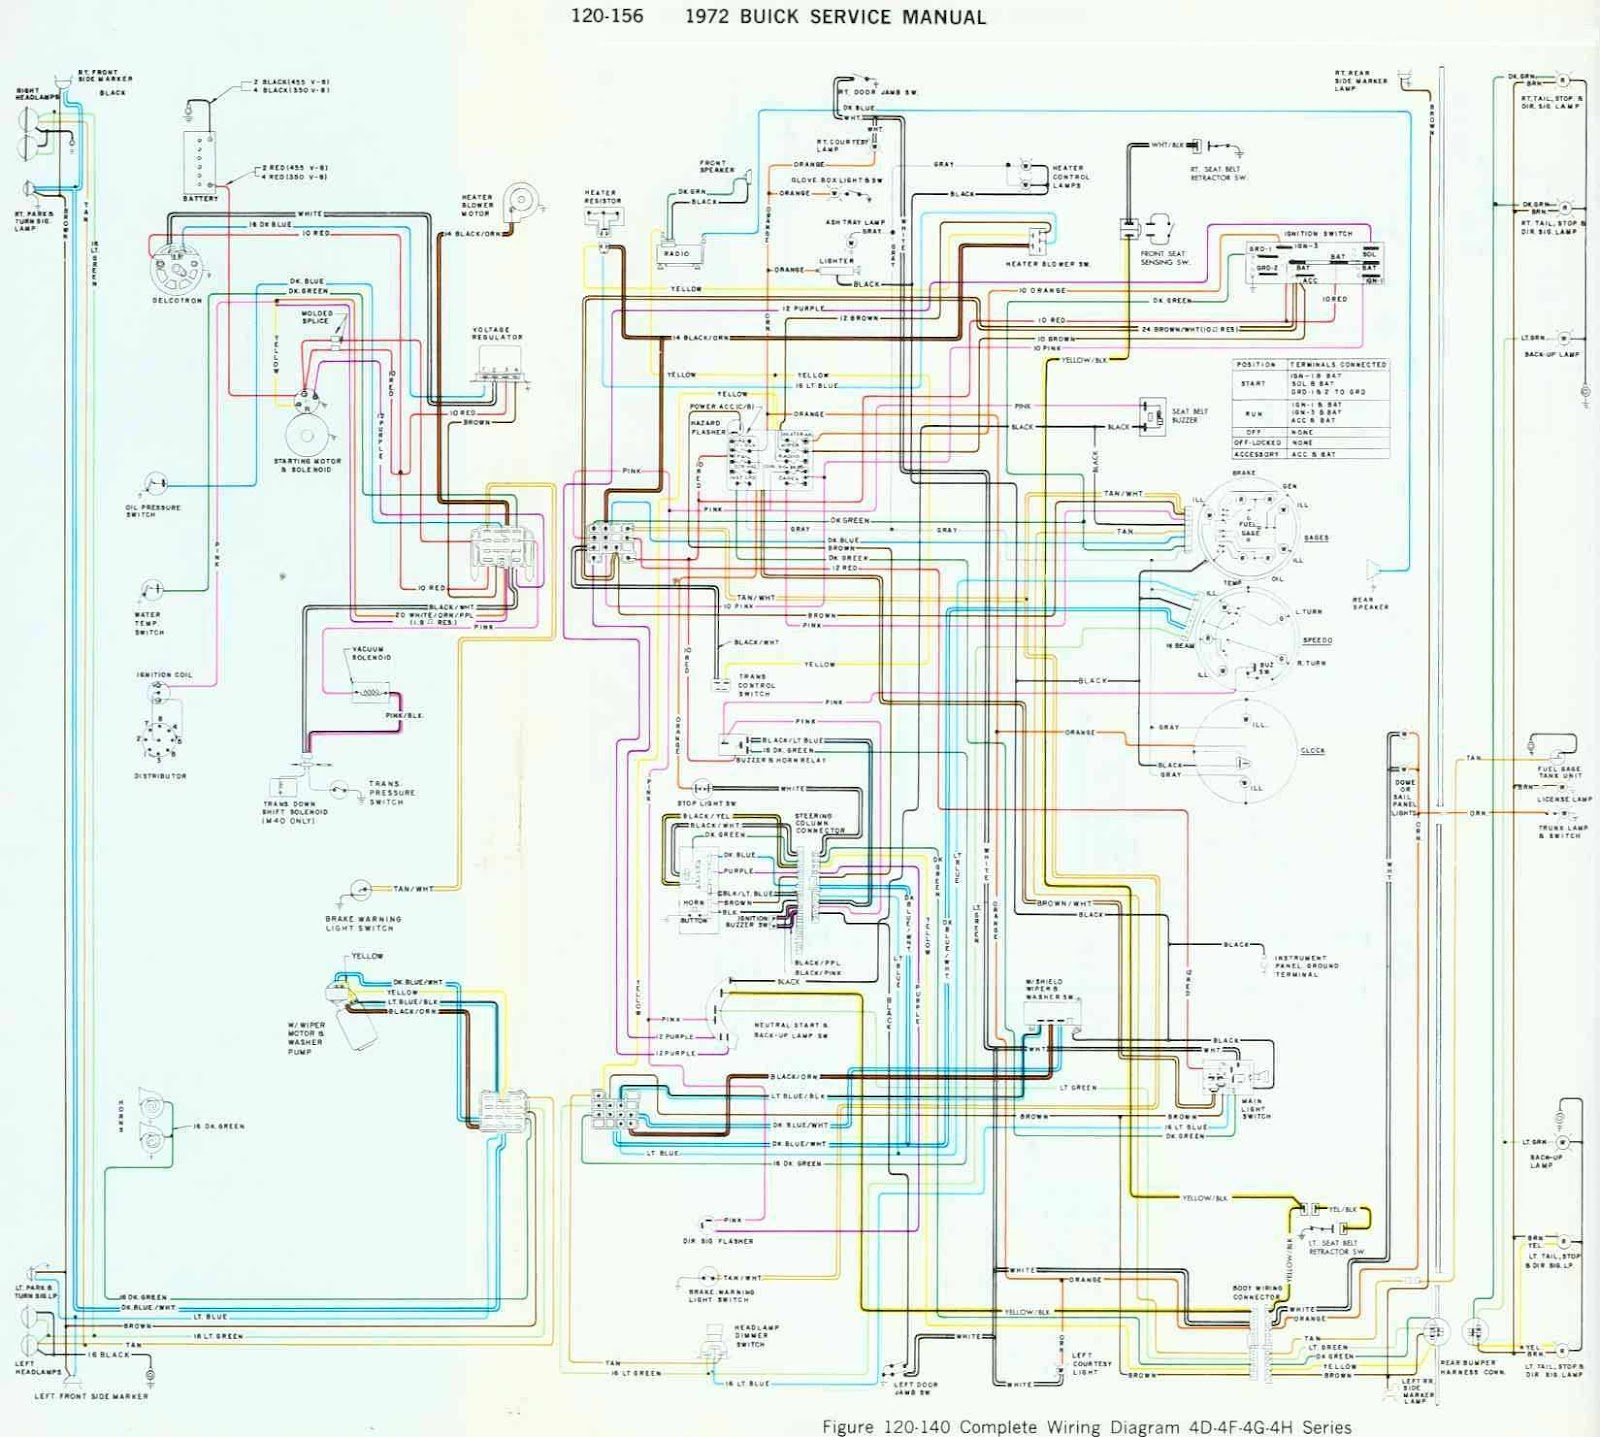 1984 Buick Wiring Diagrams Library. 1972 Buick Skylark Wiring Diagram Trusted Diagrams. Buick. Trunck Latch Wiring Diagram 1995 Buick Roadmaster At Scoala.co